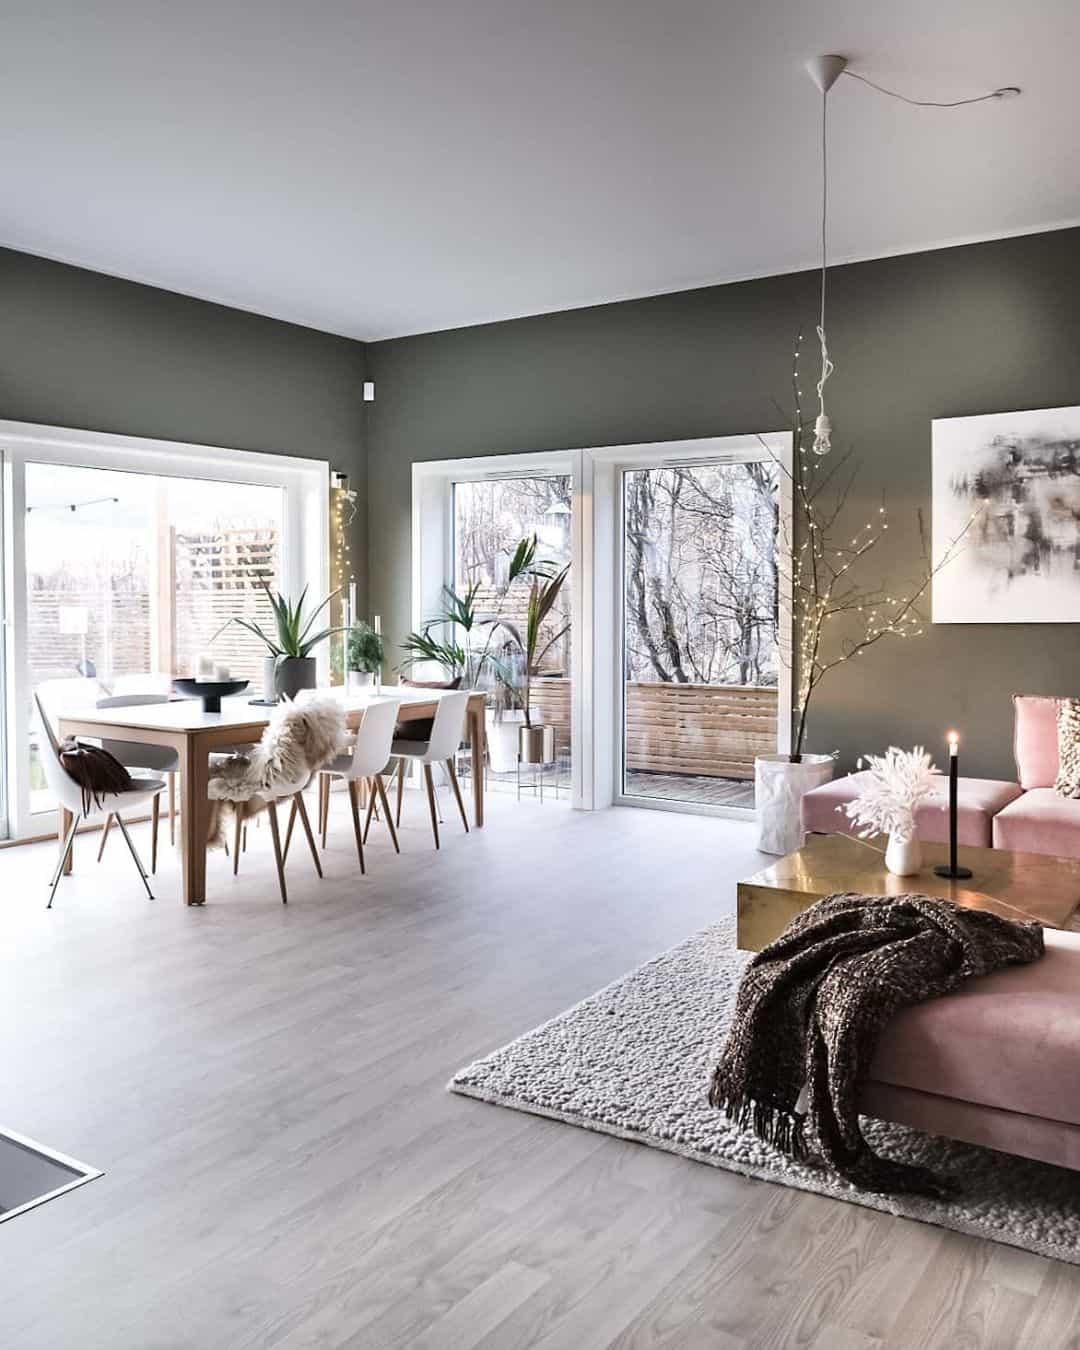 Modern interior 2020: New and creative interior design trends 2020